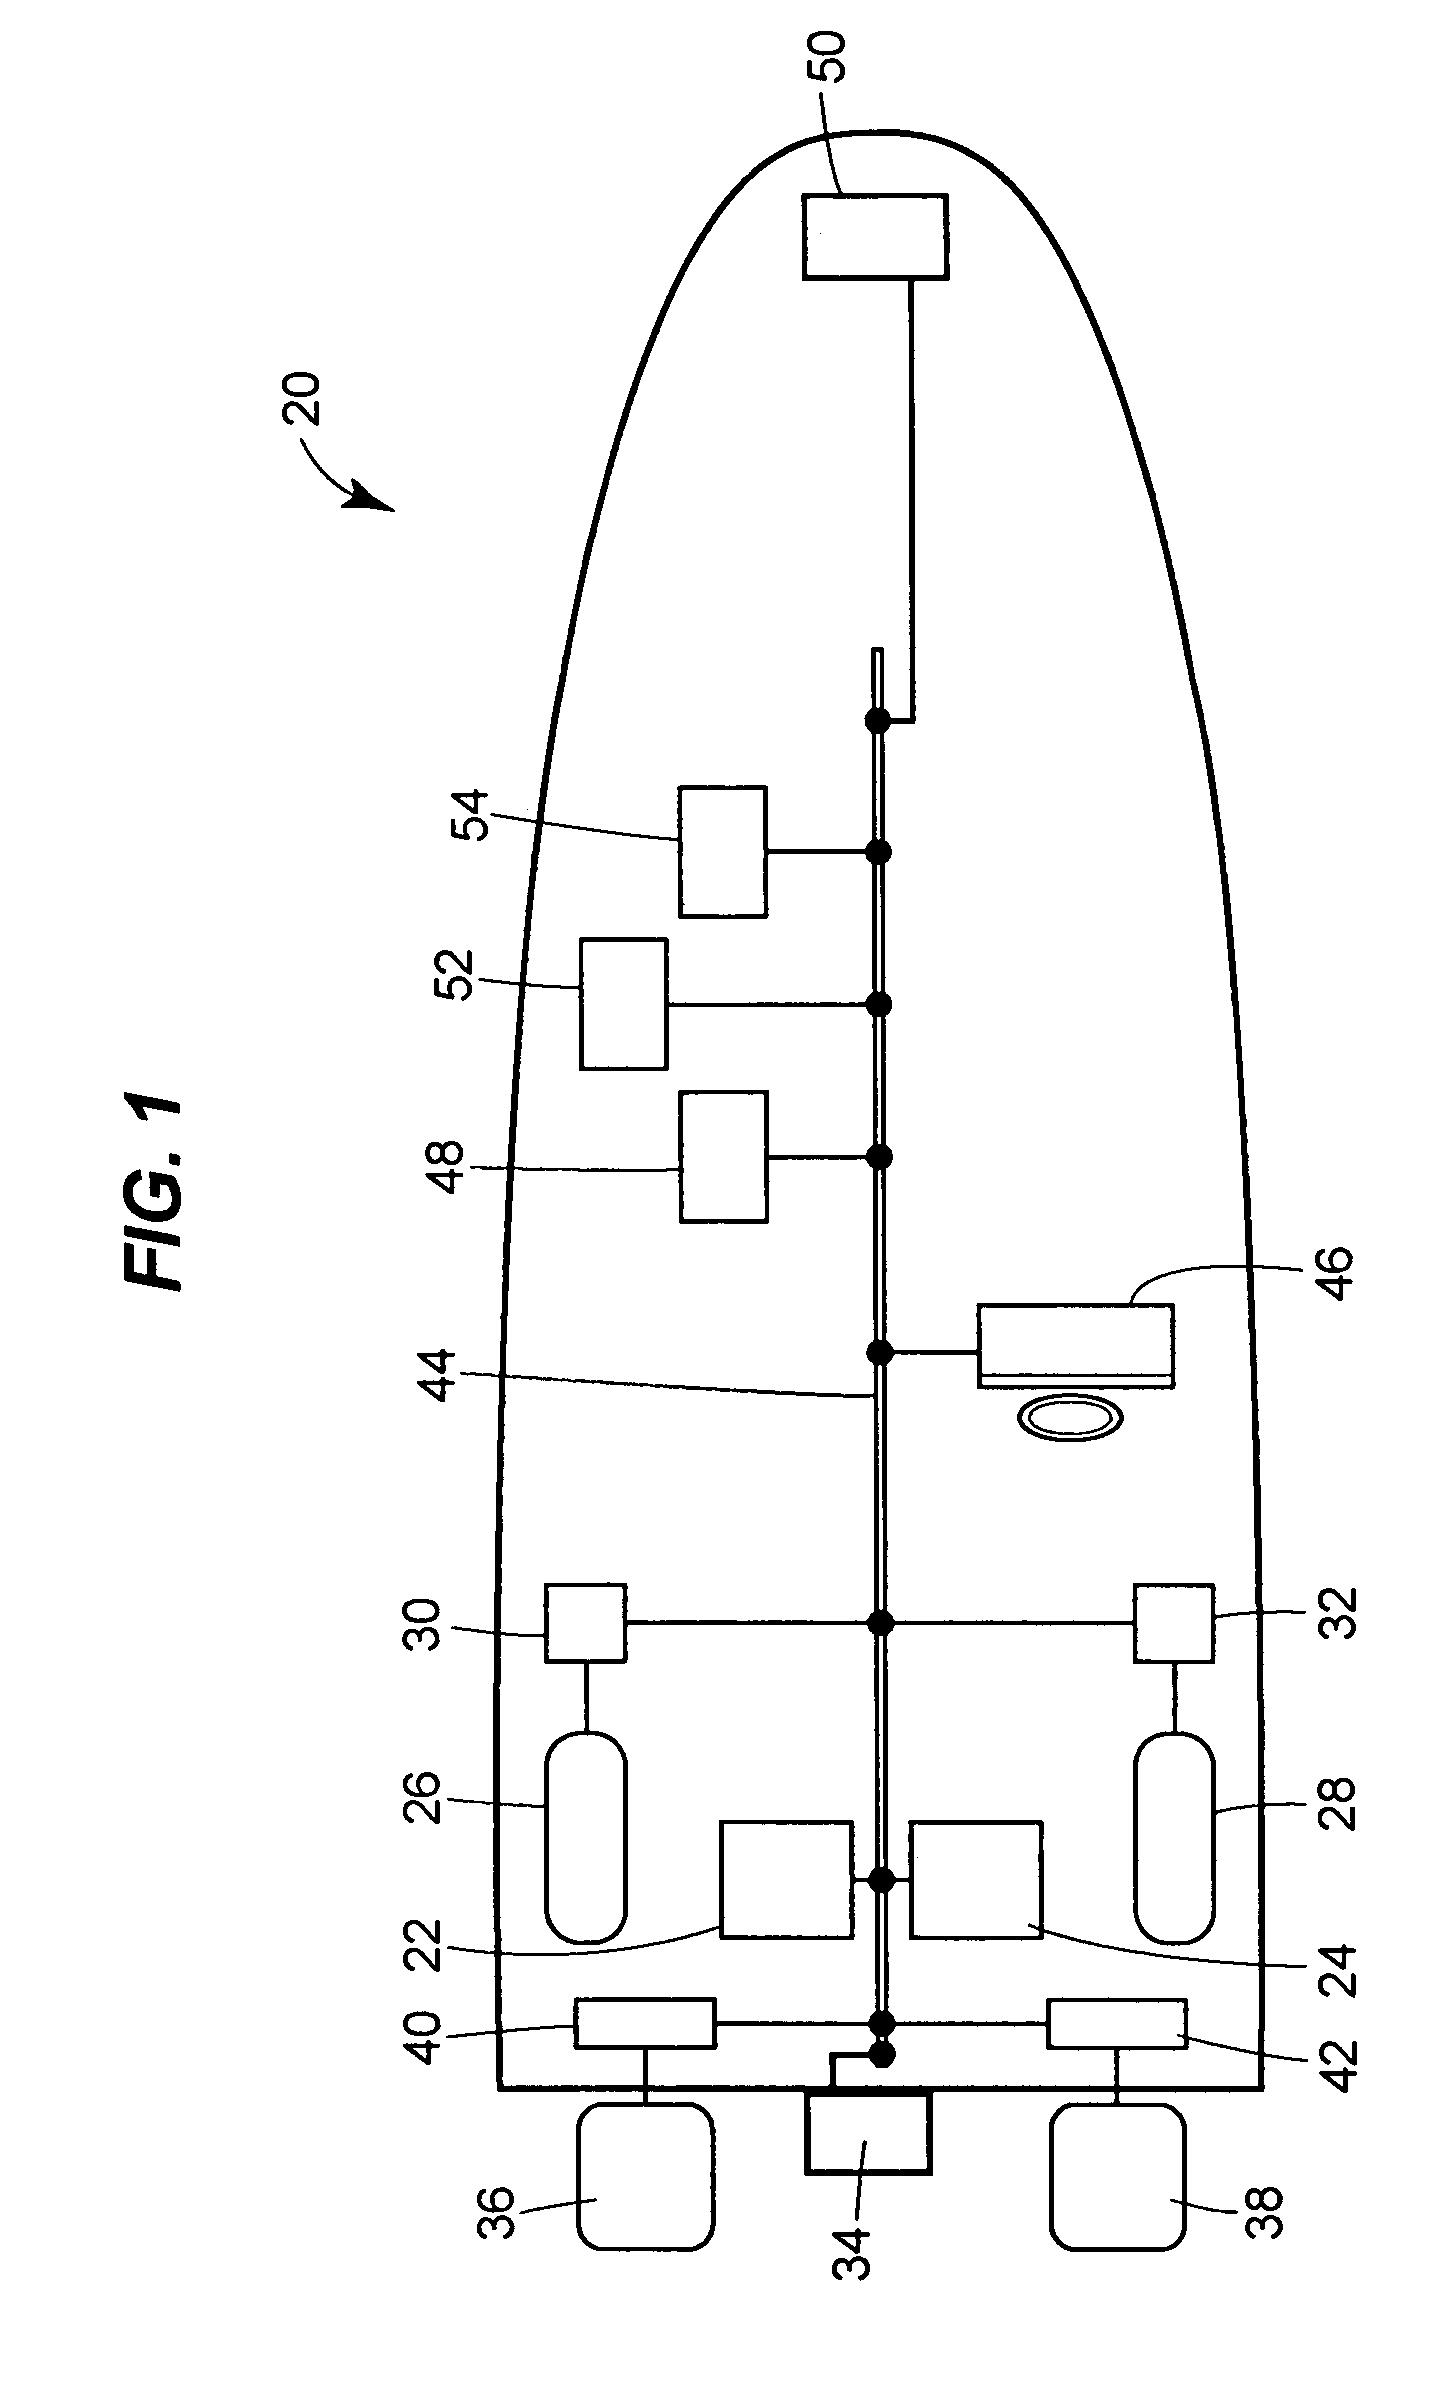 Mercury Smartcraft Sc1000 Wiring Diagram